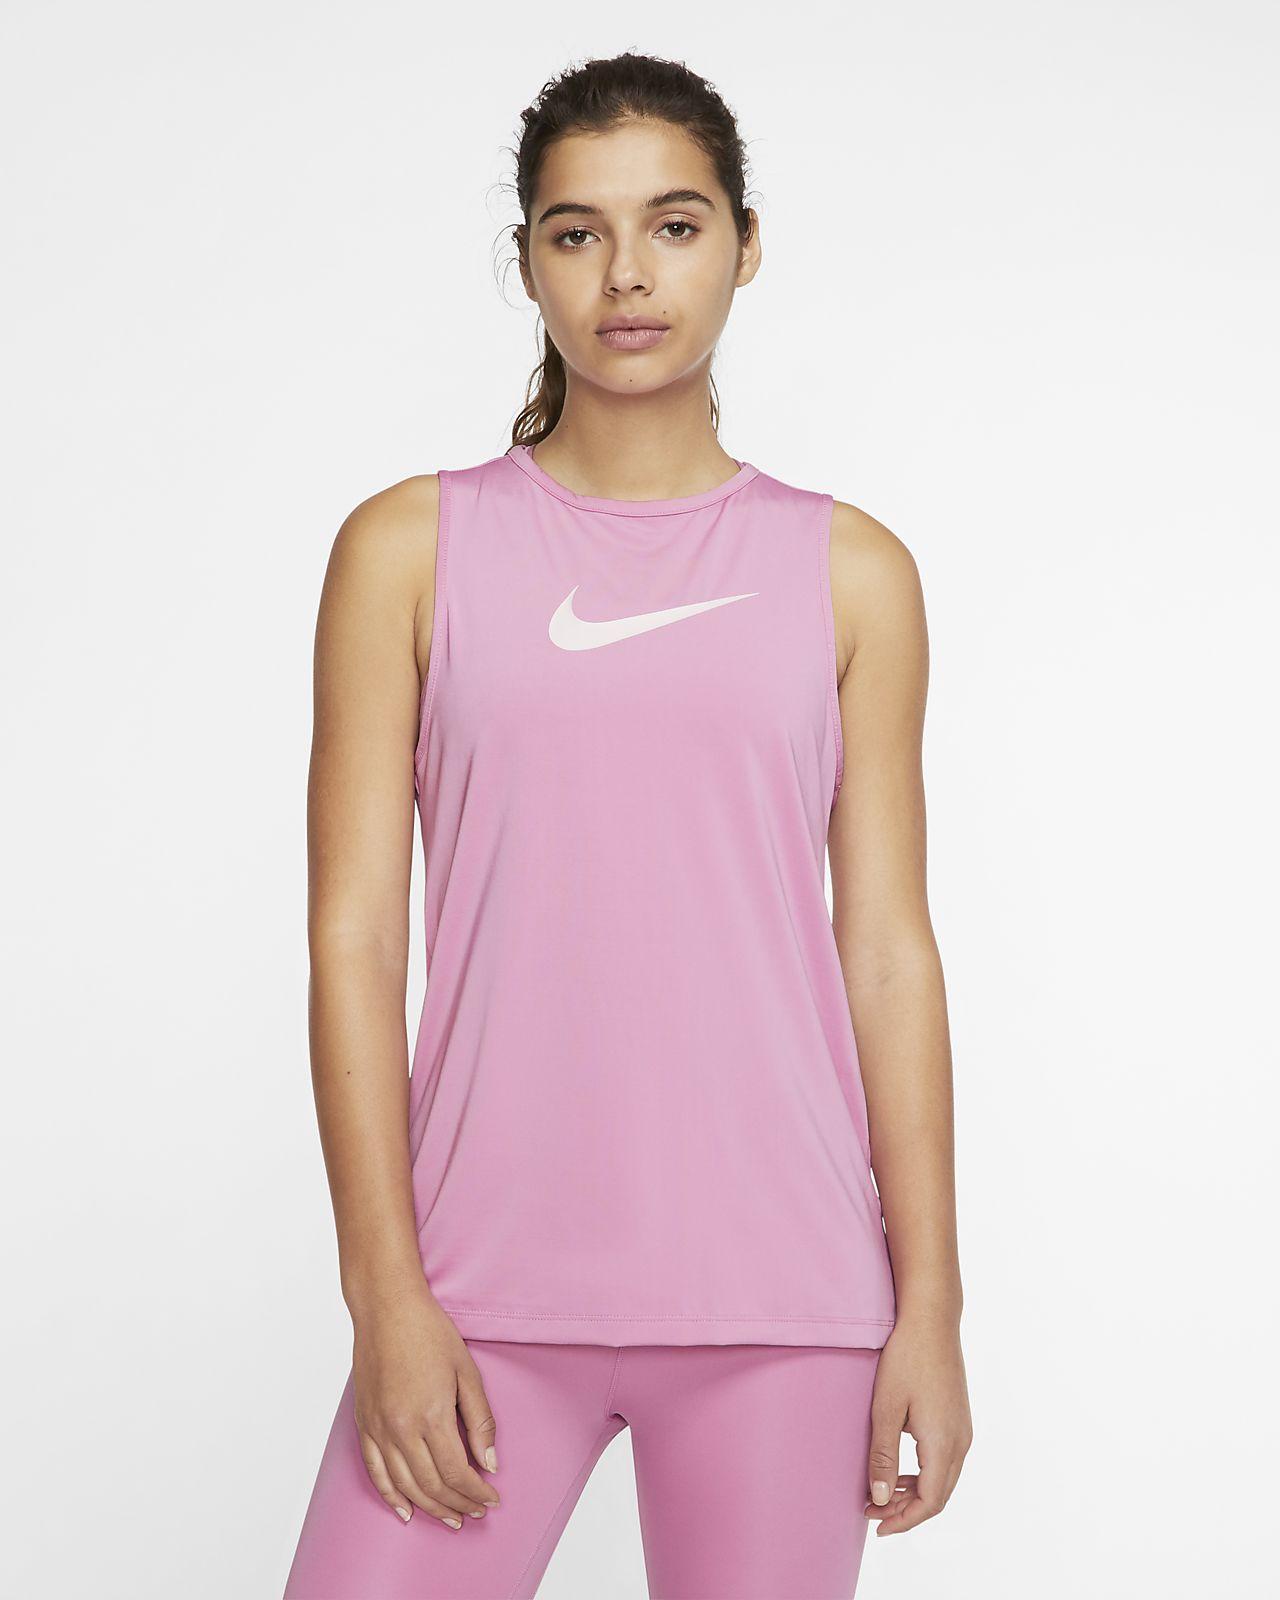 Женская майка с логотипом Swoosh Nike Pro